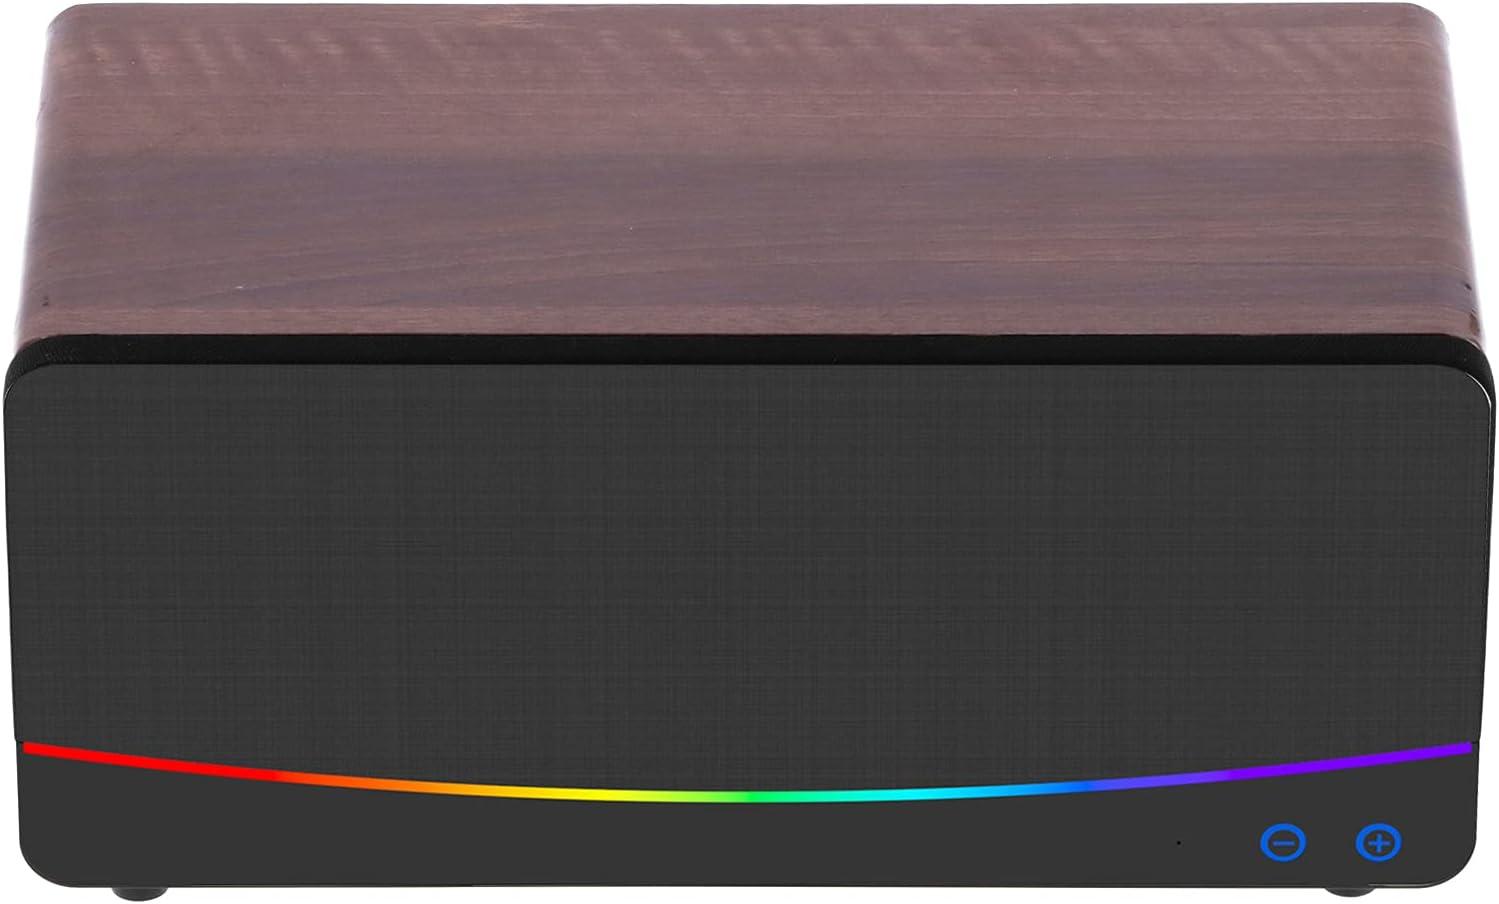 Max 80% OFF Lazmin112 Wooden Over item handling ☆ Bookshelf Bluetooth Speaker Desktop Loudspeaker